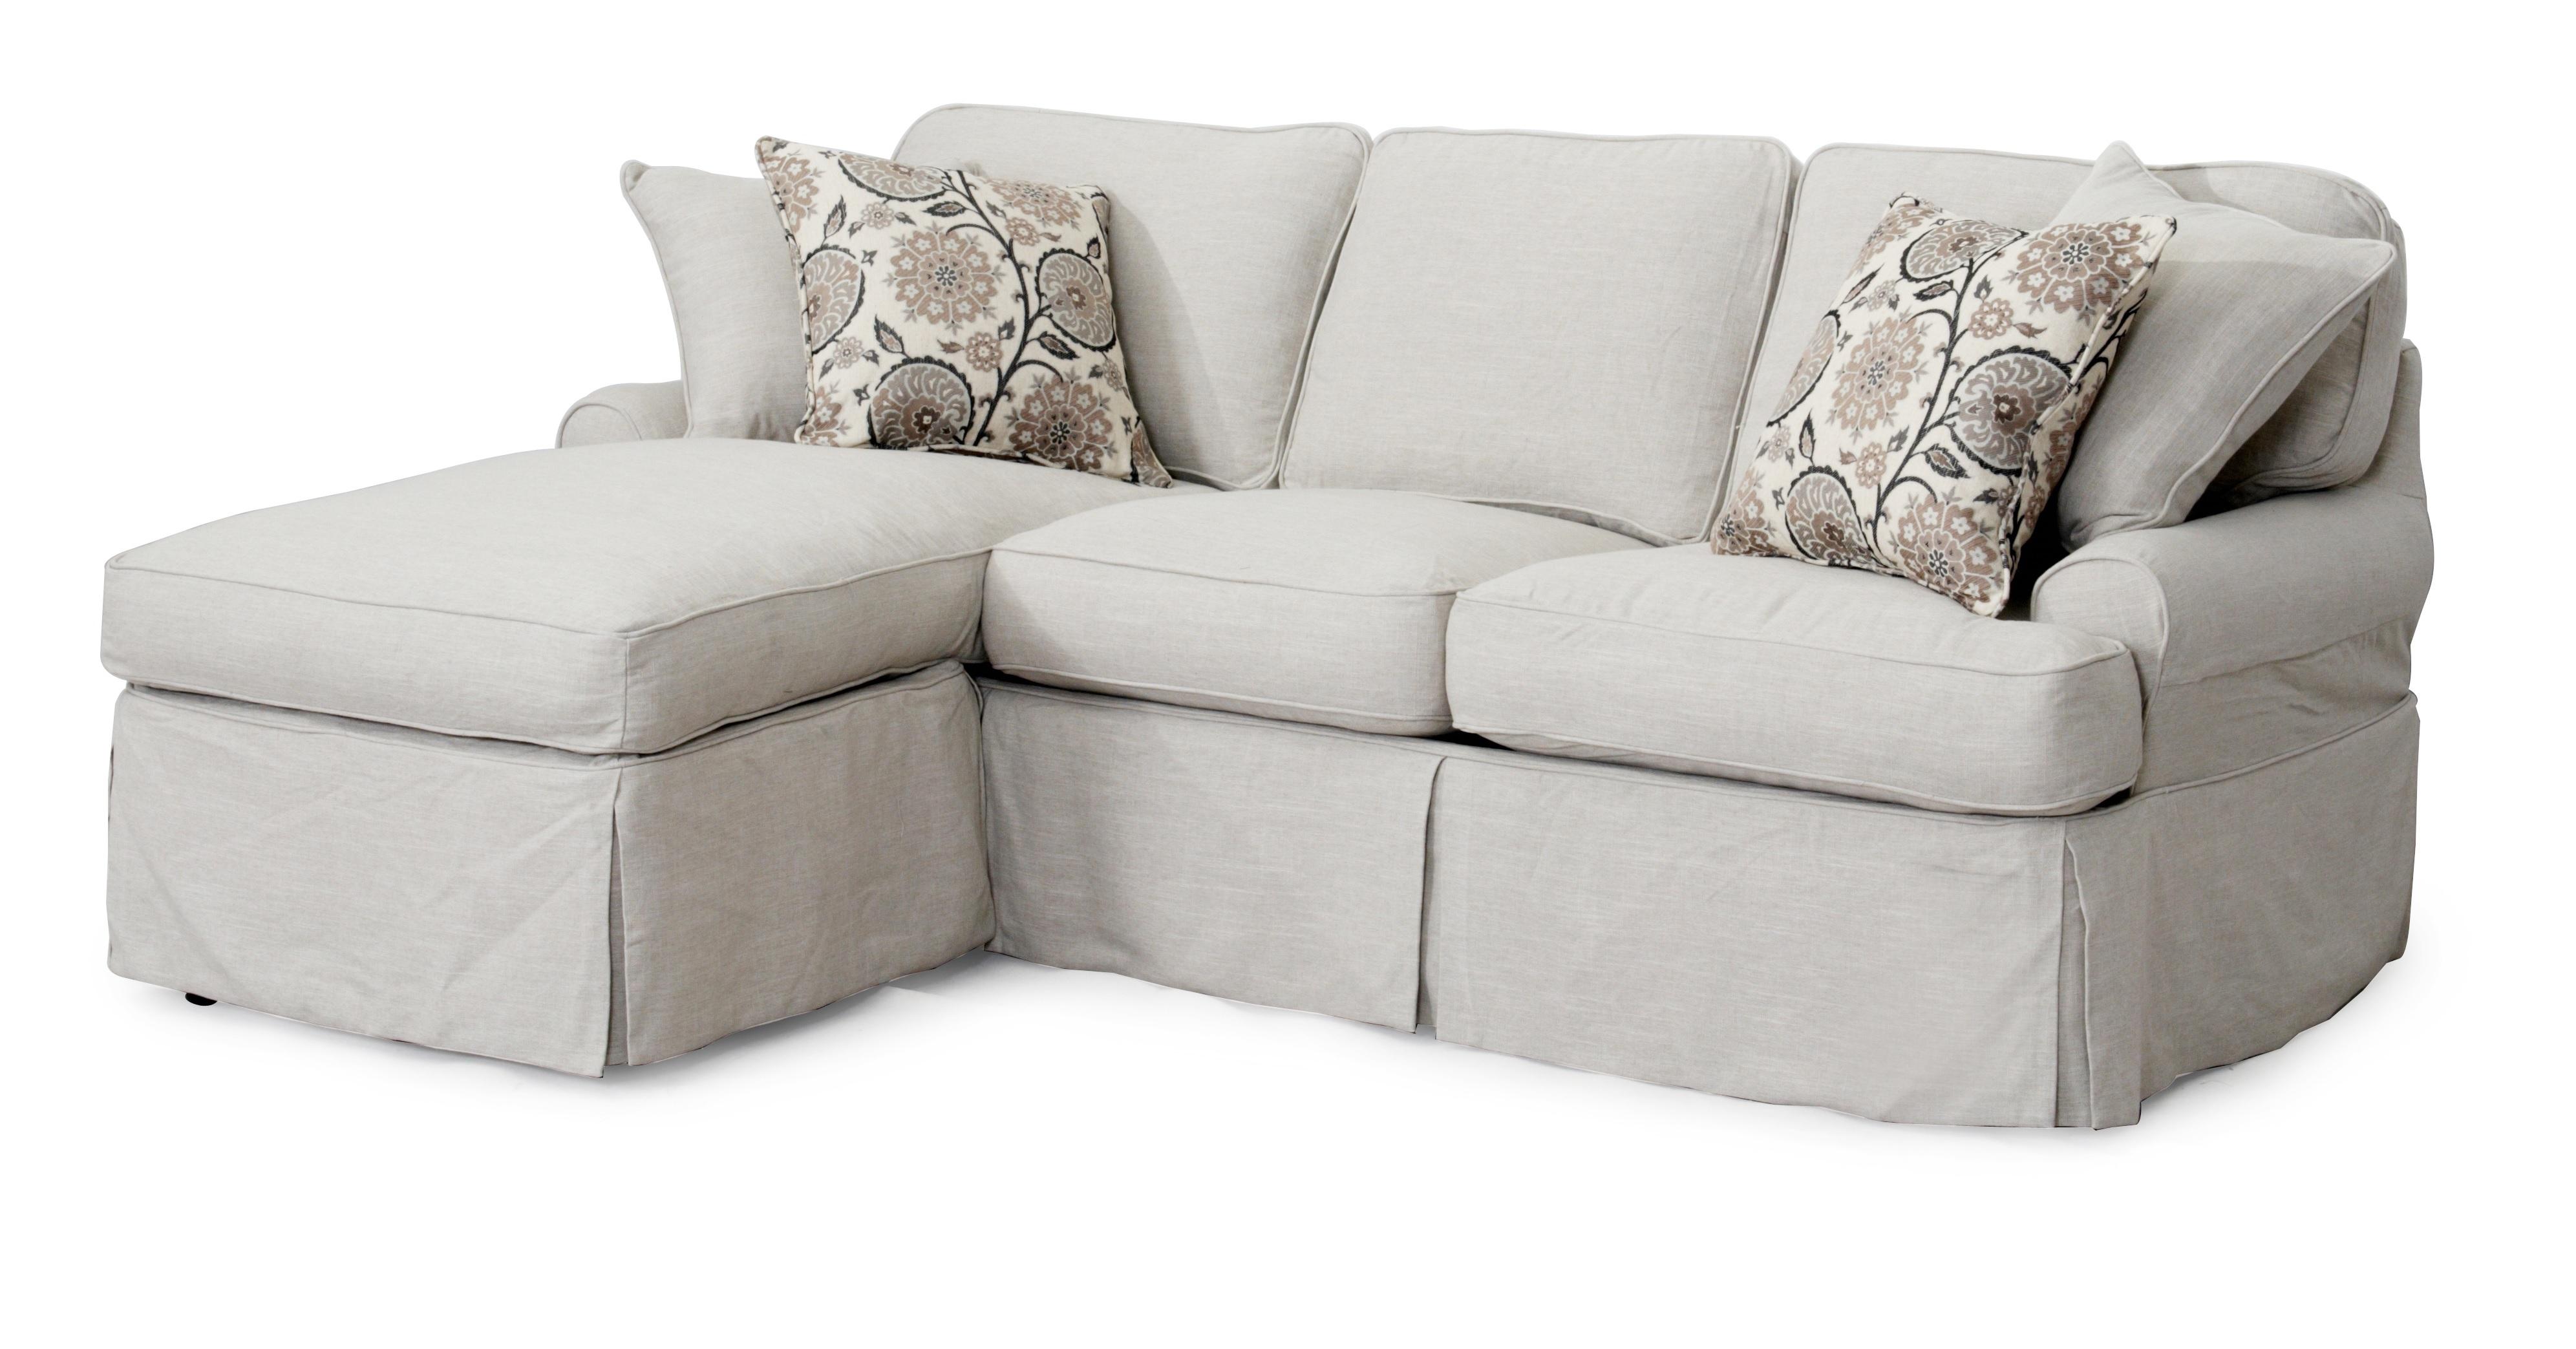 sleeper sofa covers photo - 2